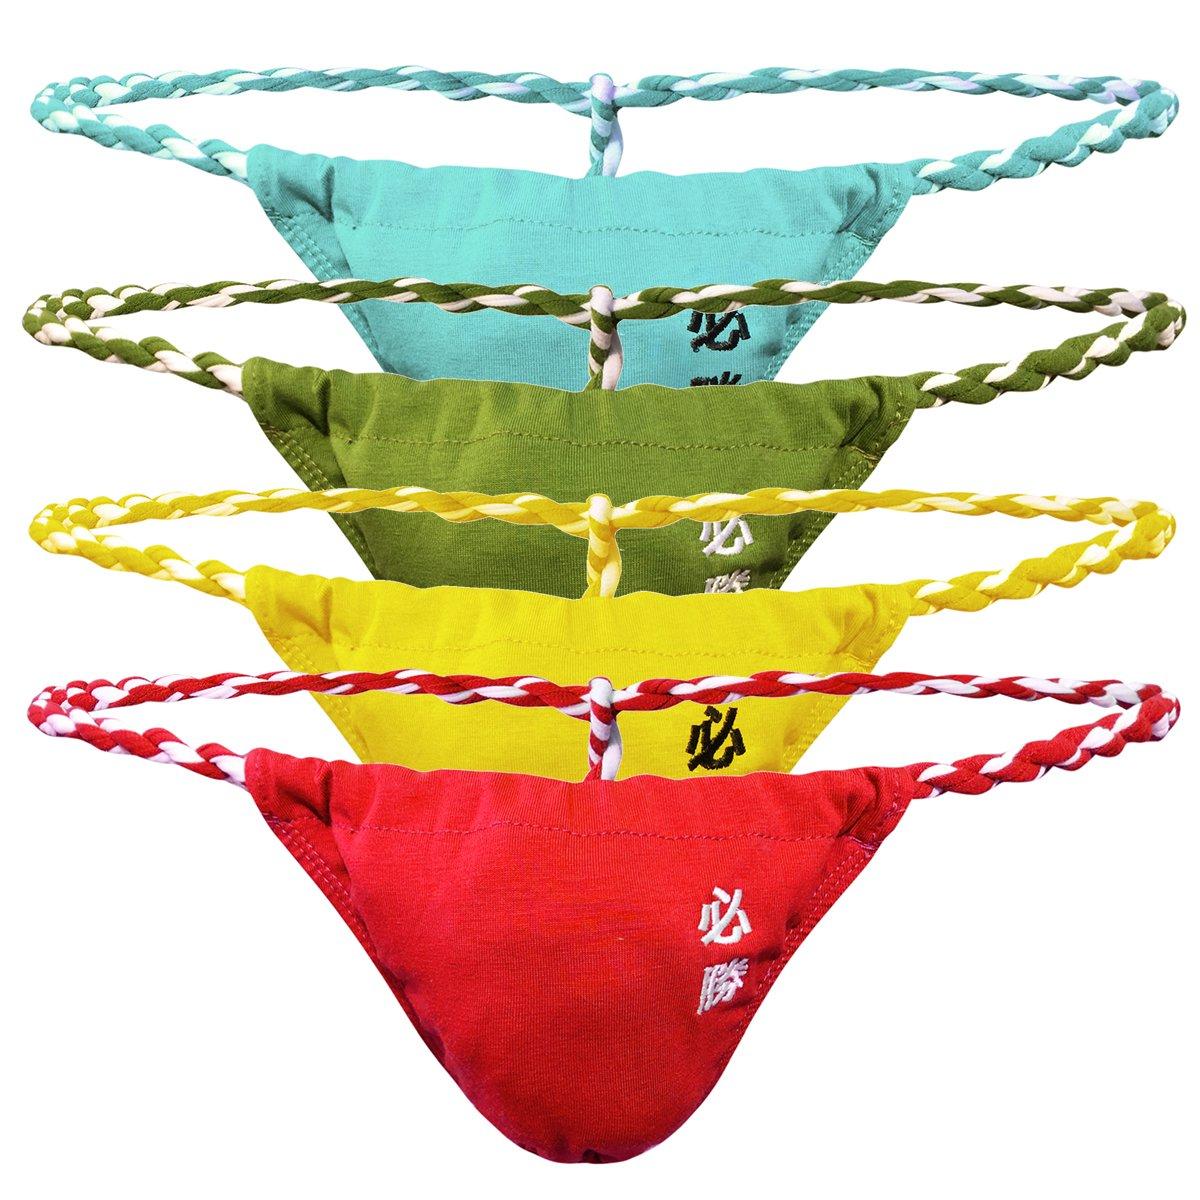 Sexy Men G-String Thongs T-Back Underwear Bikini Wrestling Sumo Briefs Tangas